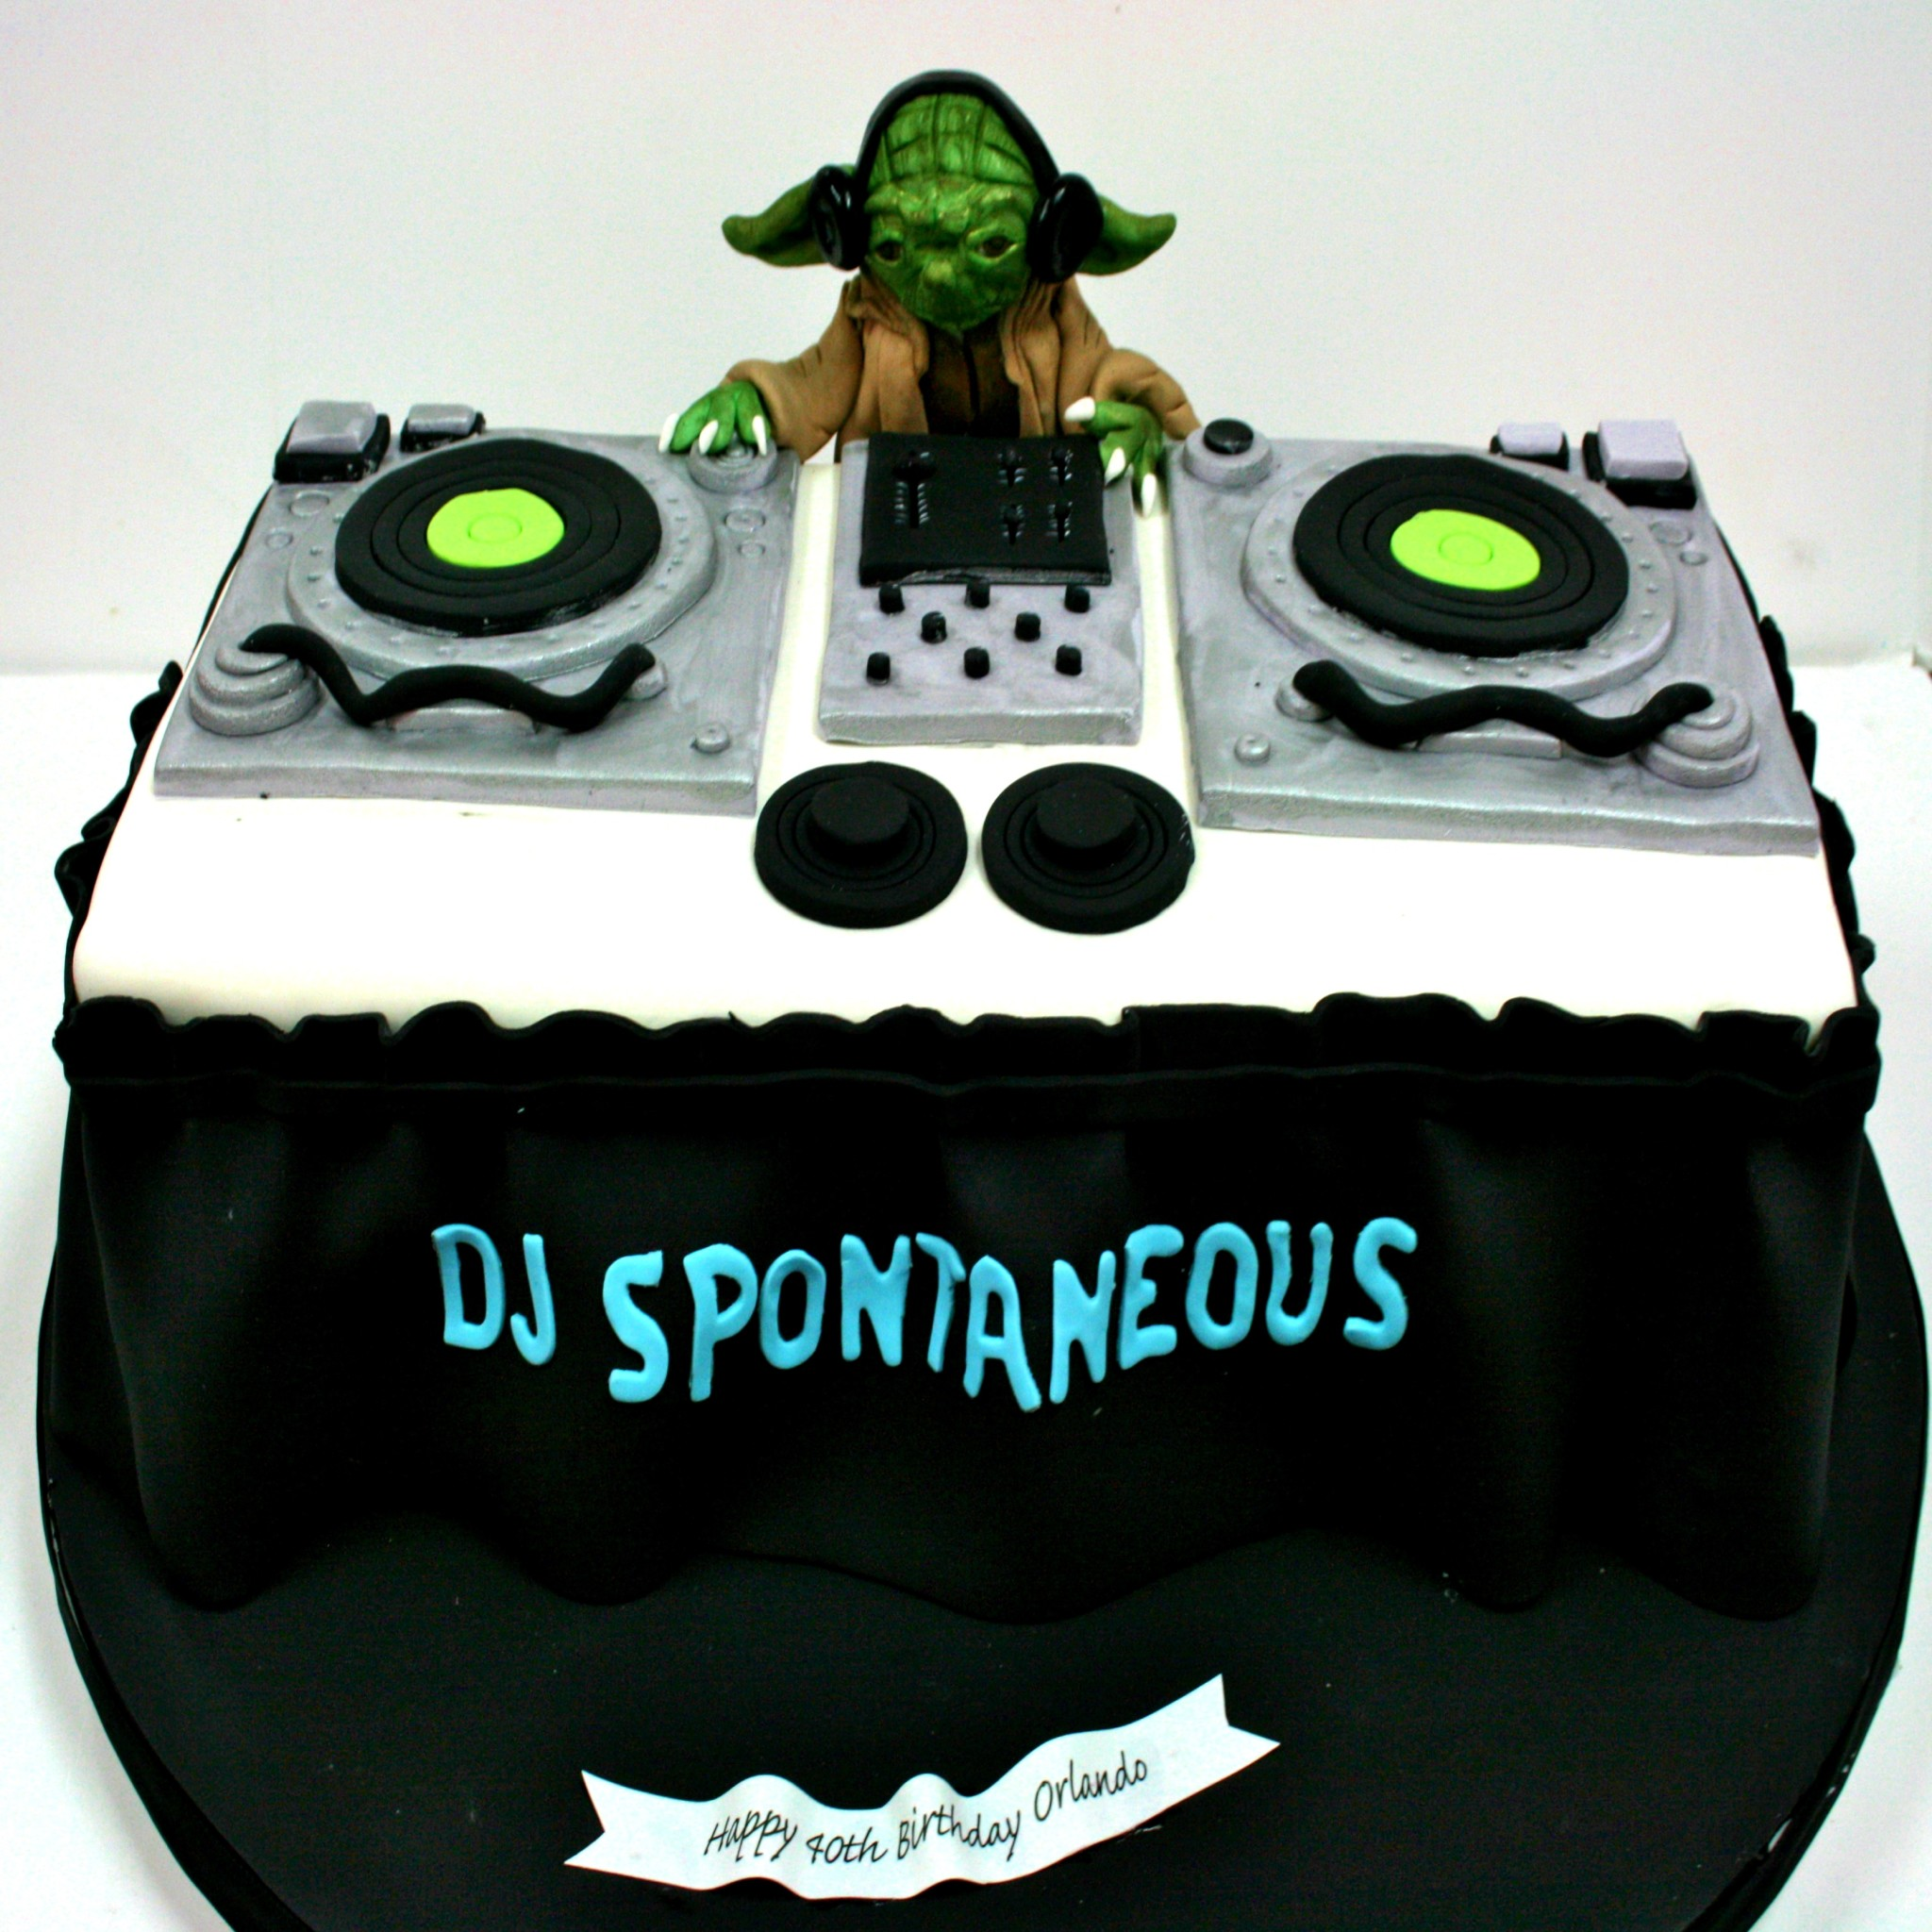 Marvelous 10 Dj Turntables Birthday Cakes Photo Dj Turntable Birthday Cake Personalised Birthday Cards Cominlily Jamesorg